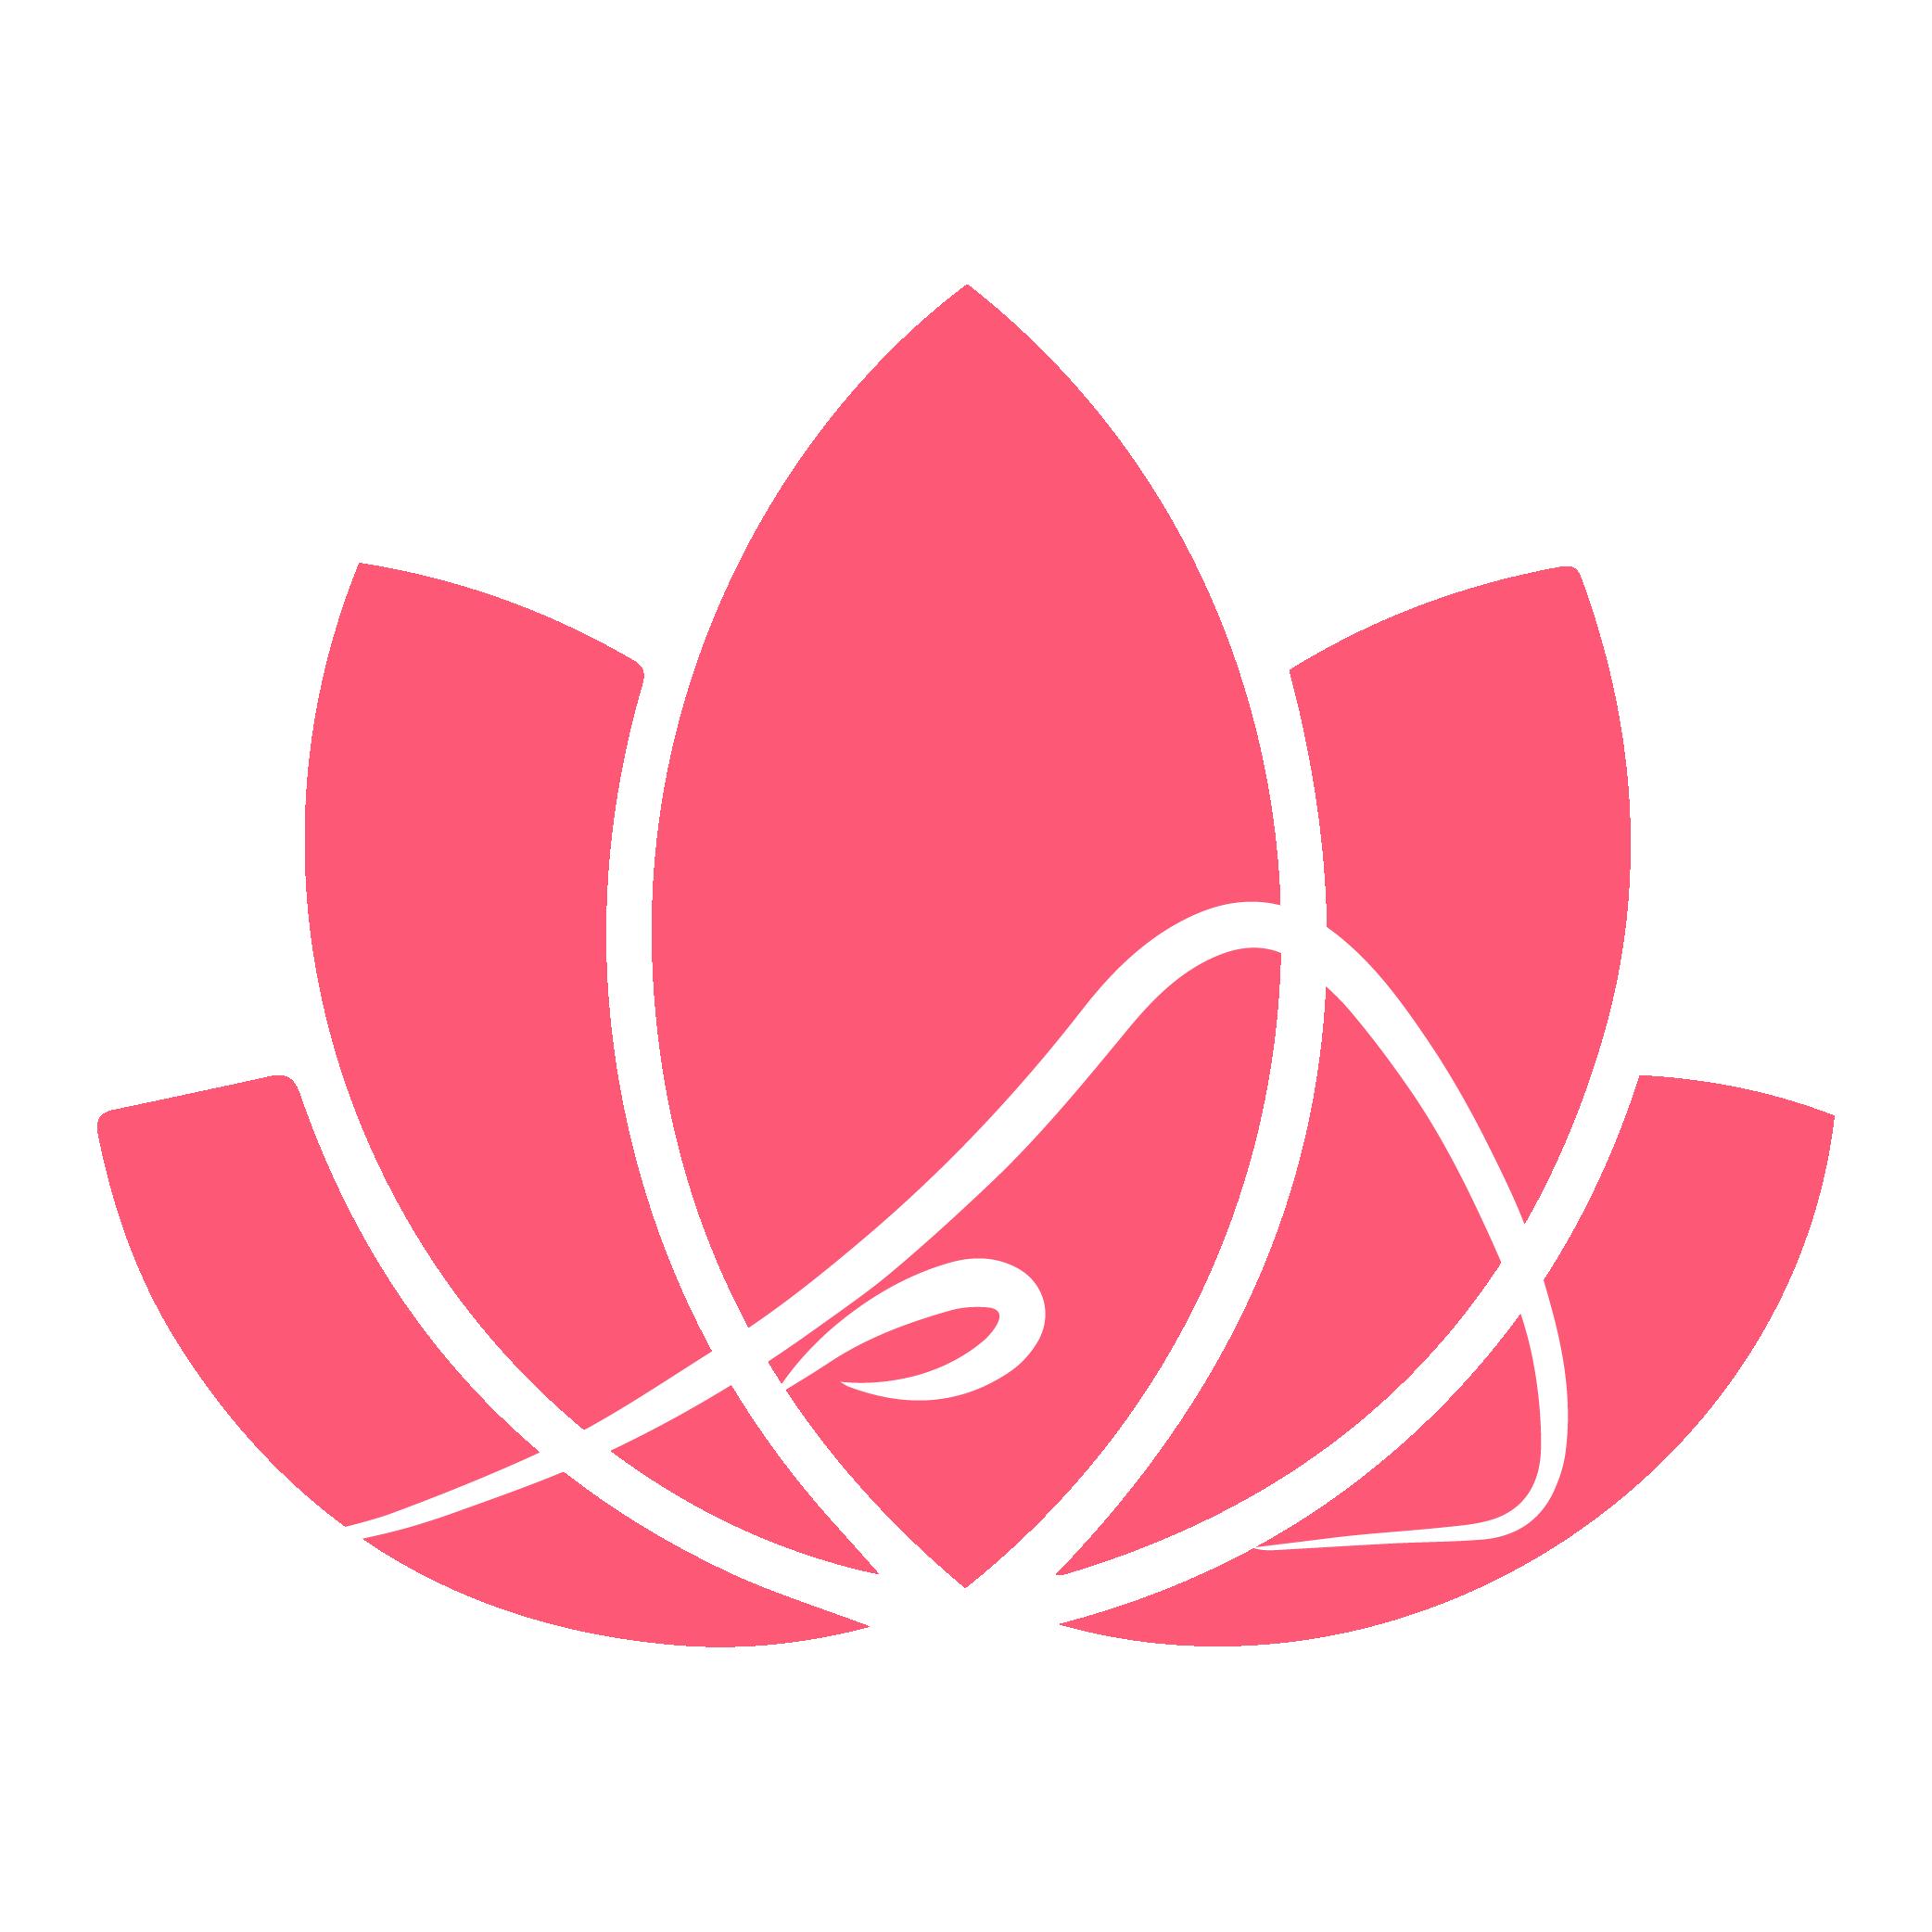 https://kamlayoga.com/wp-content/uploads/2020/03/logo-vinyasa-yoga.png